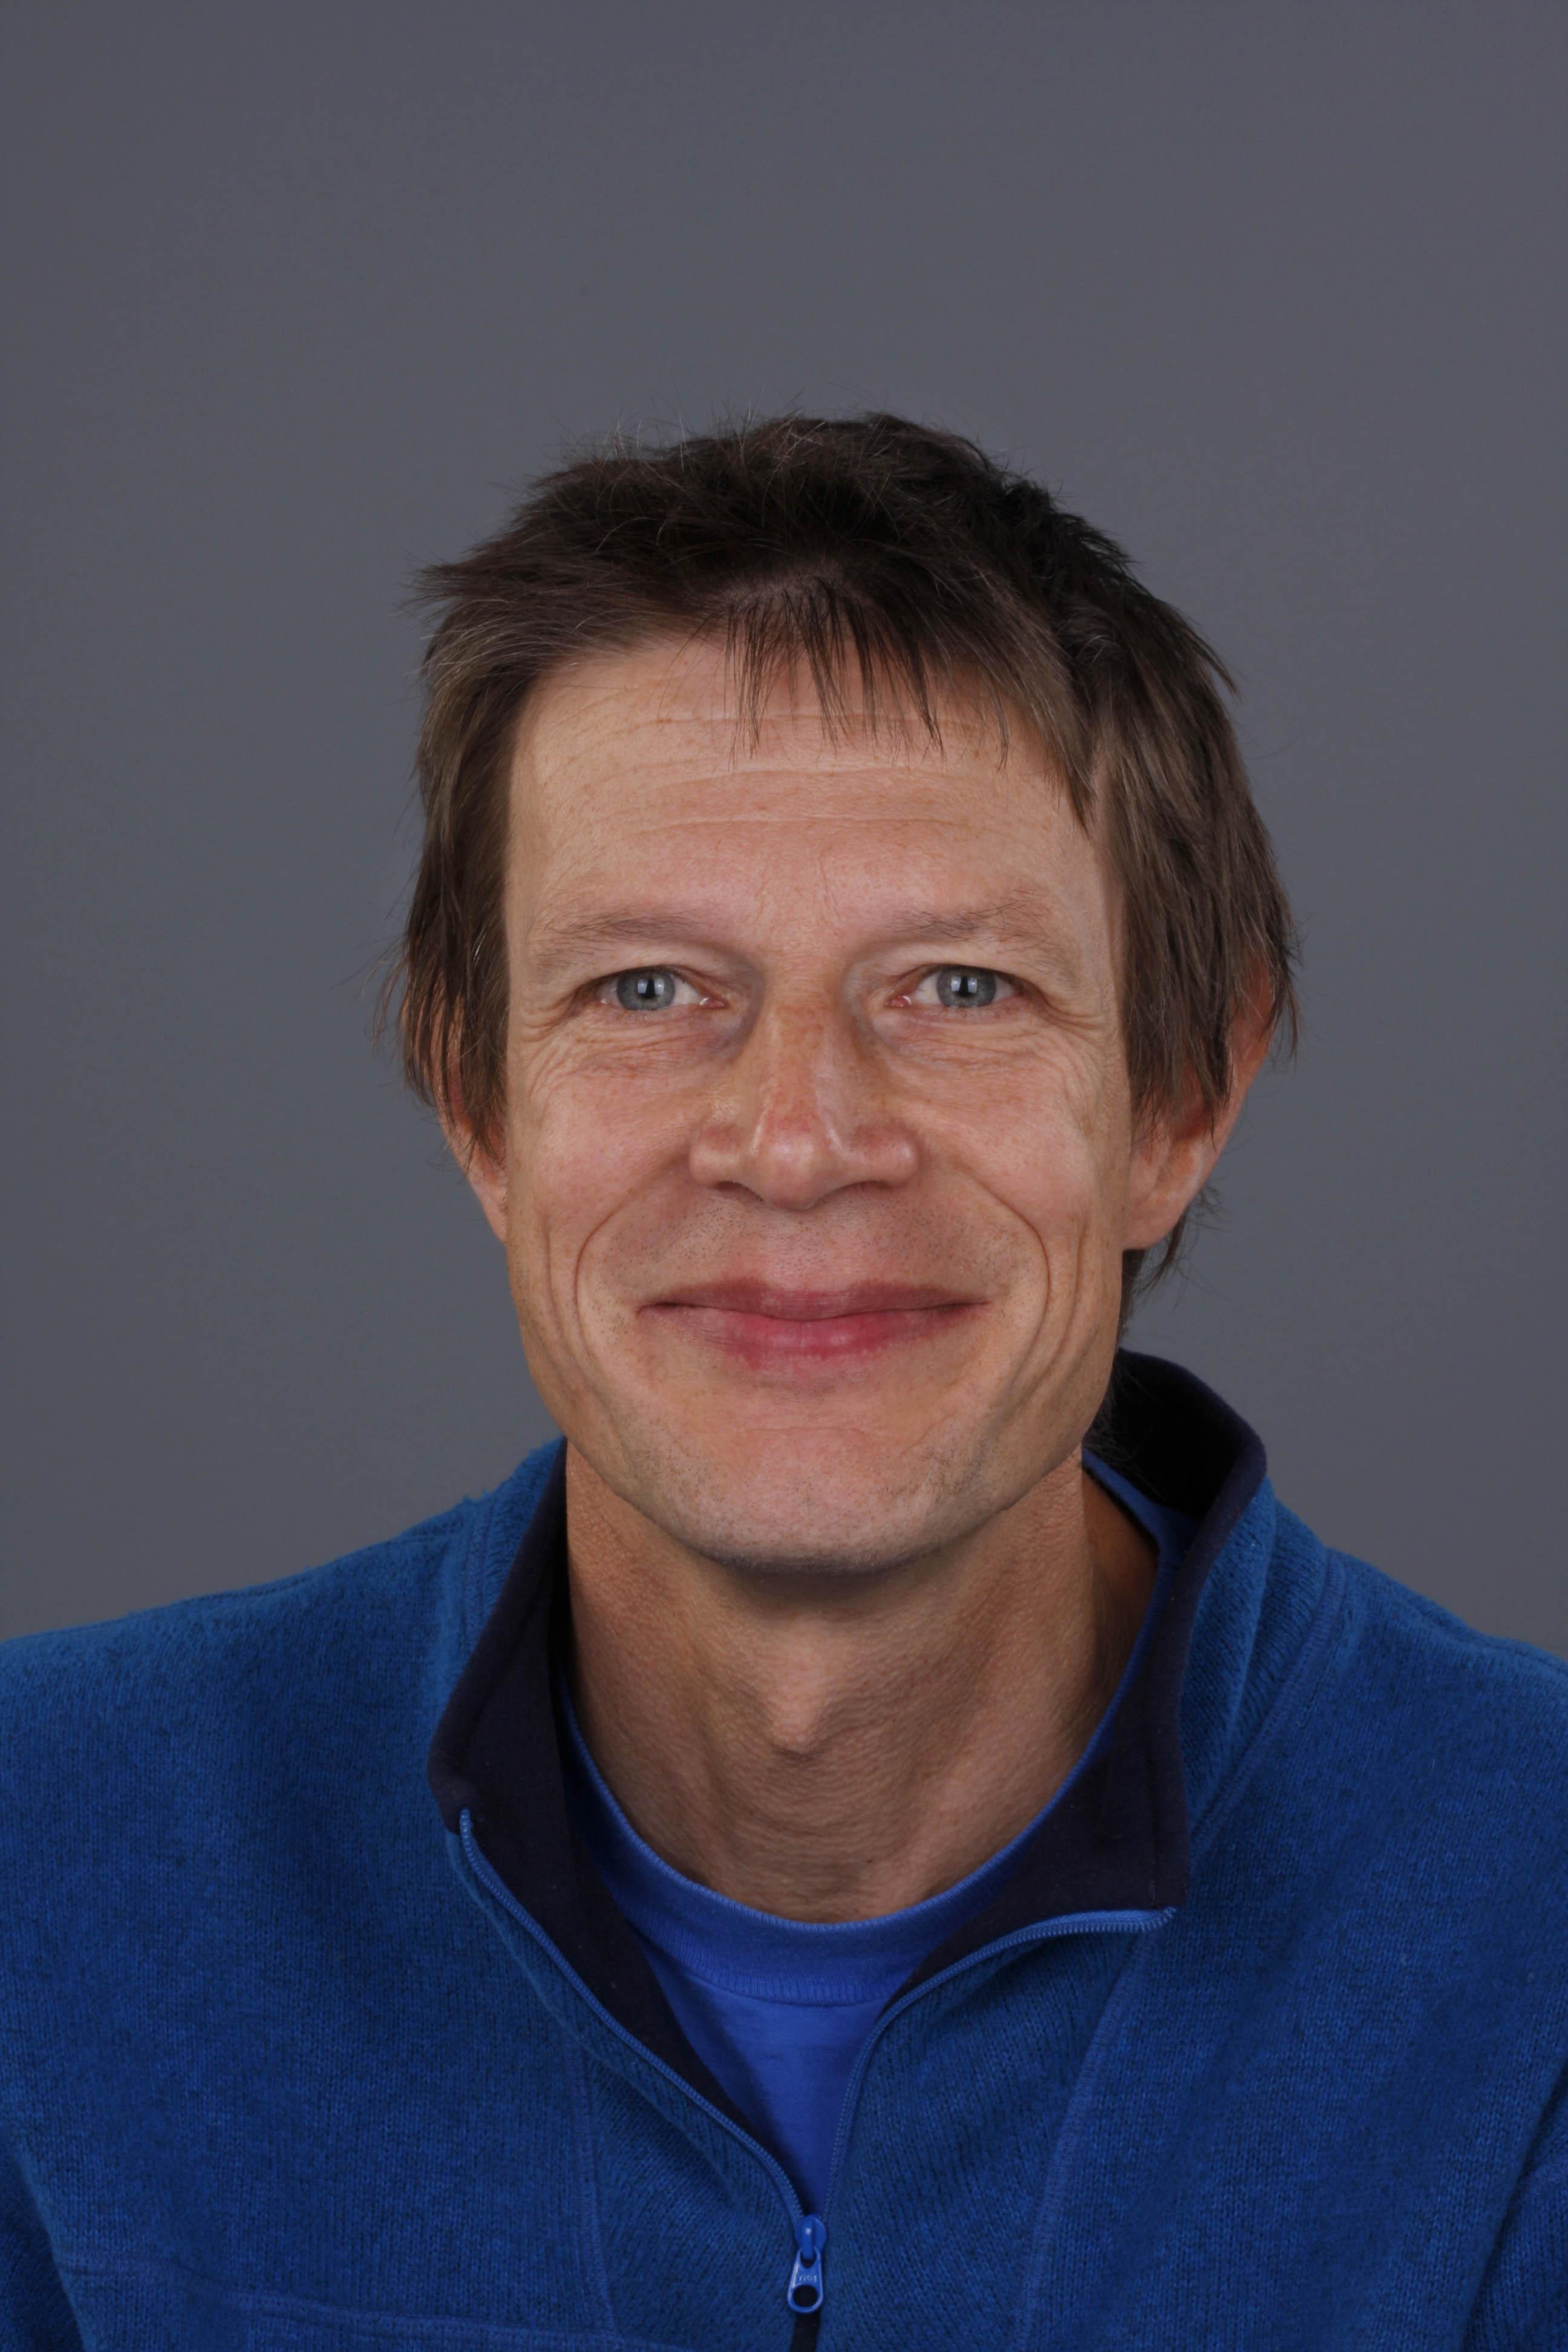 Berendschot, dr. T.T.J.M.